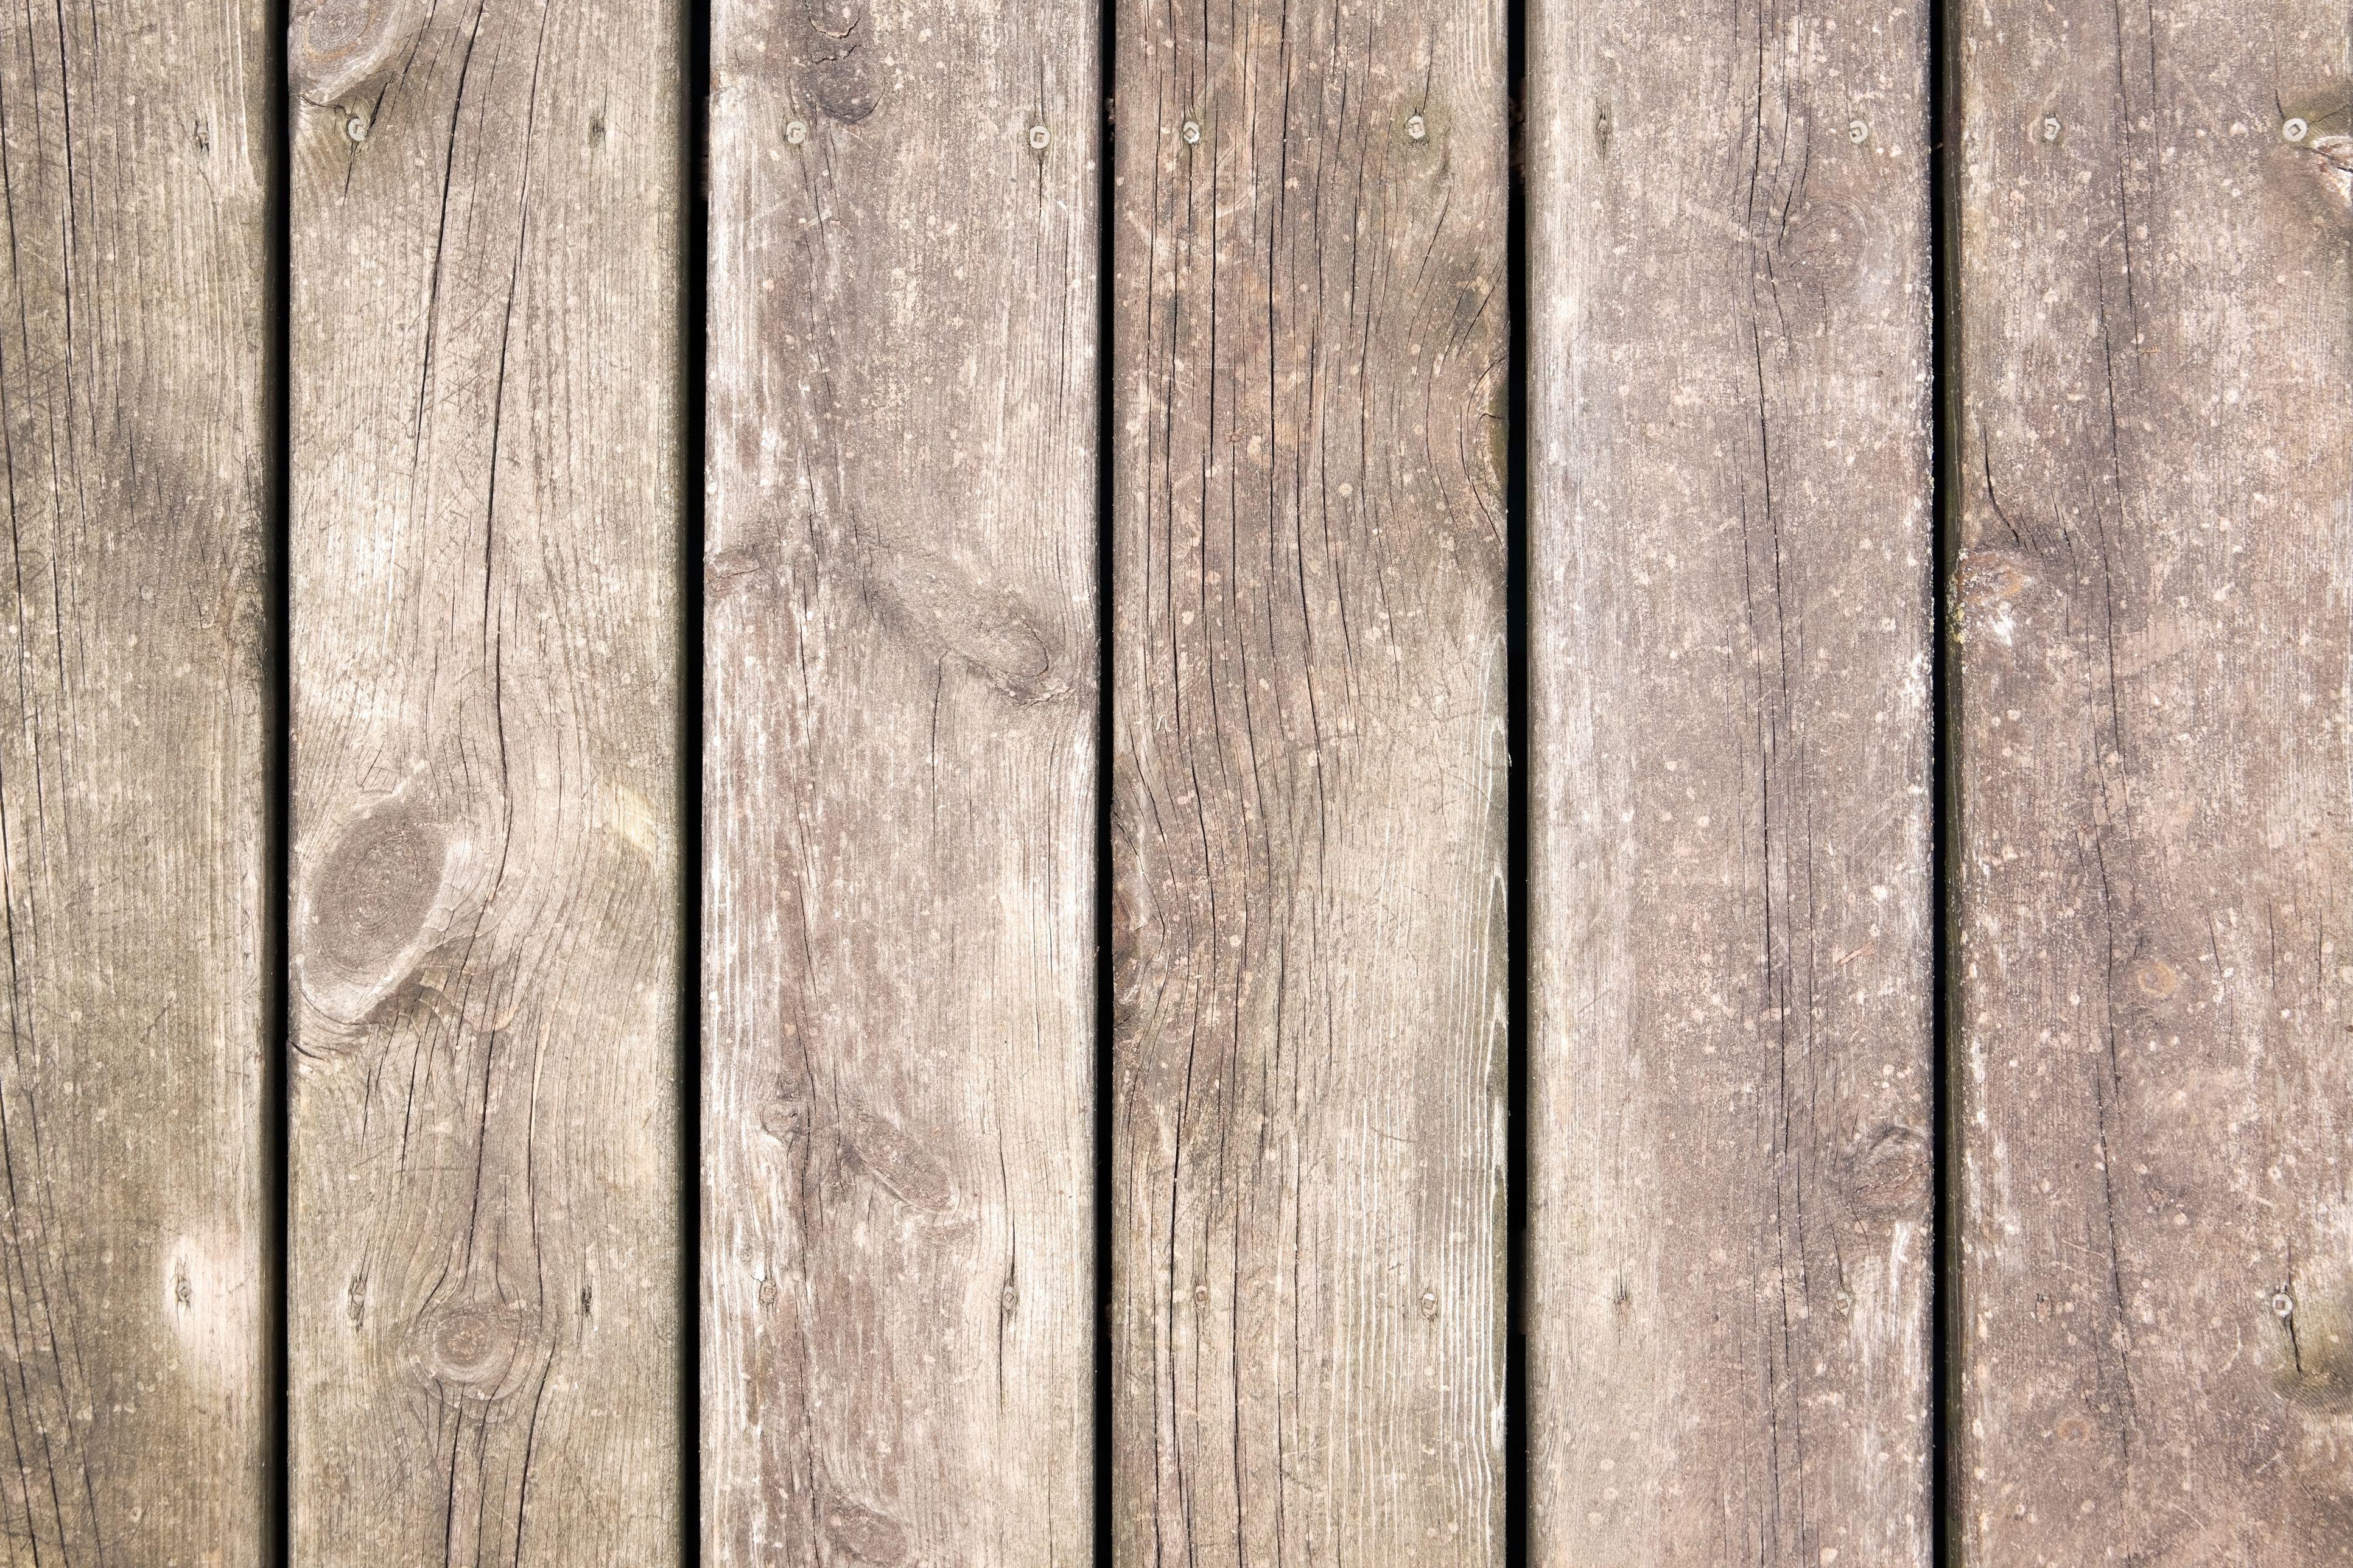 orbital sander for hardwood floors of refinishing a wood deck an overview regarding weathered deck board background 171342280 5810fdcd3df78c2c7315c473